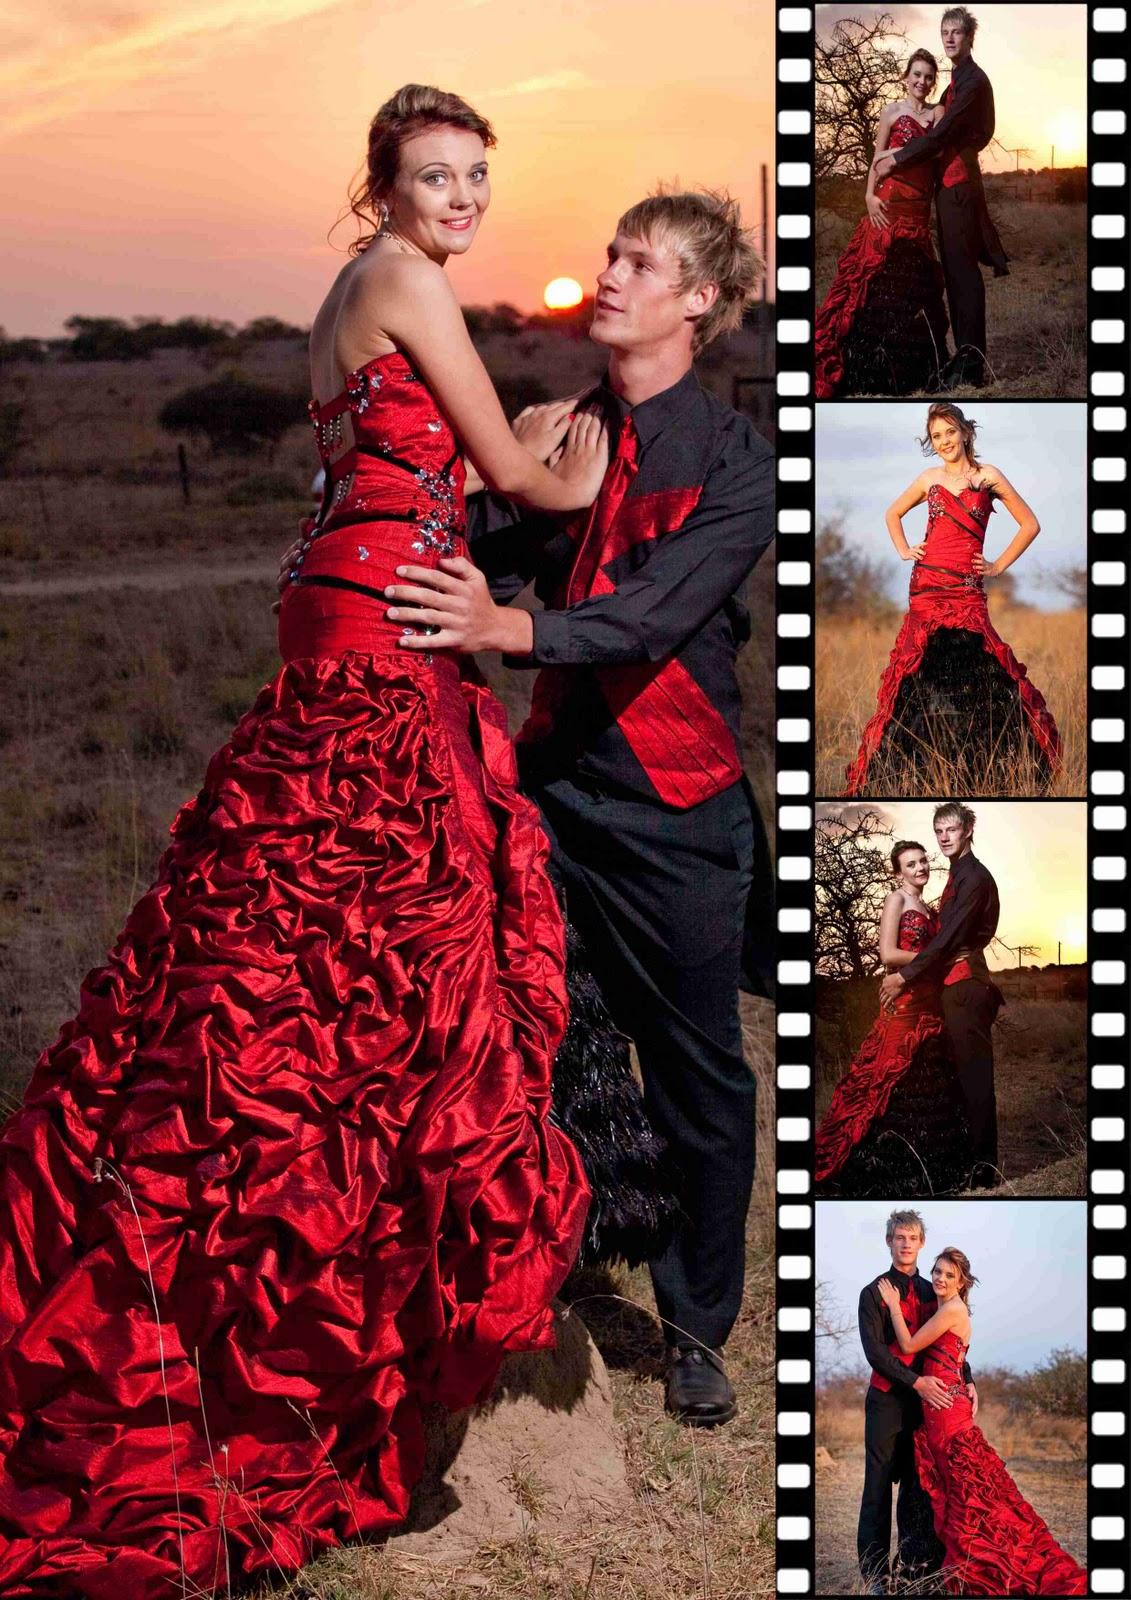 Matric Farewell Prom Make Up: Nico Willoughby-Smith Fashion Designer: A Cinderella Story